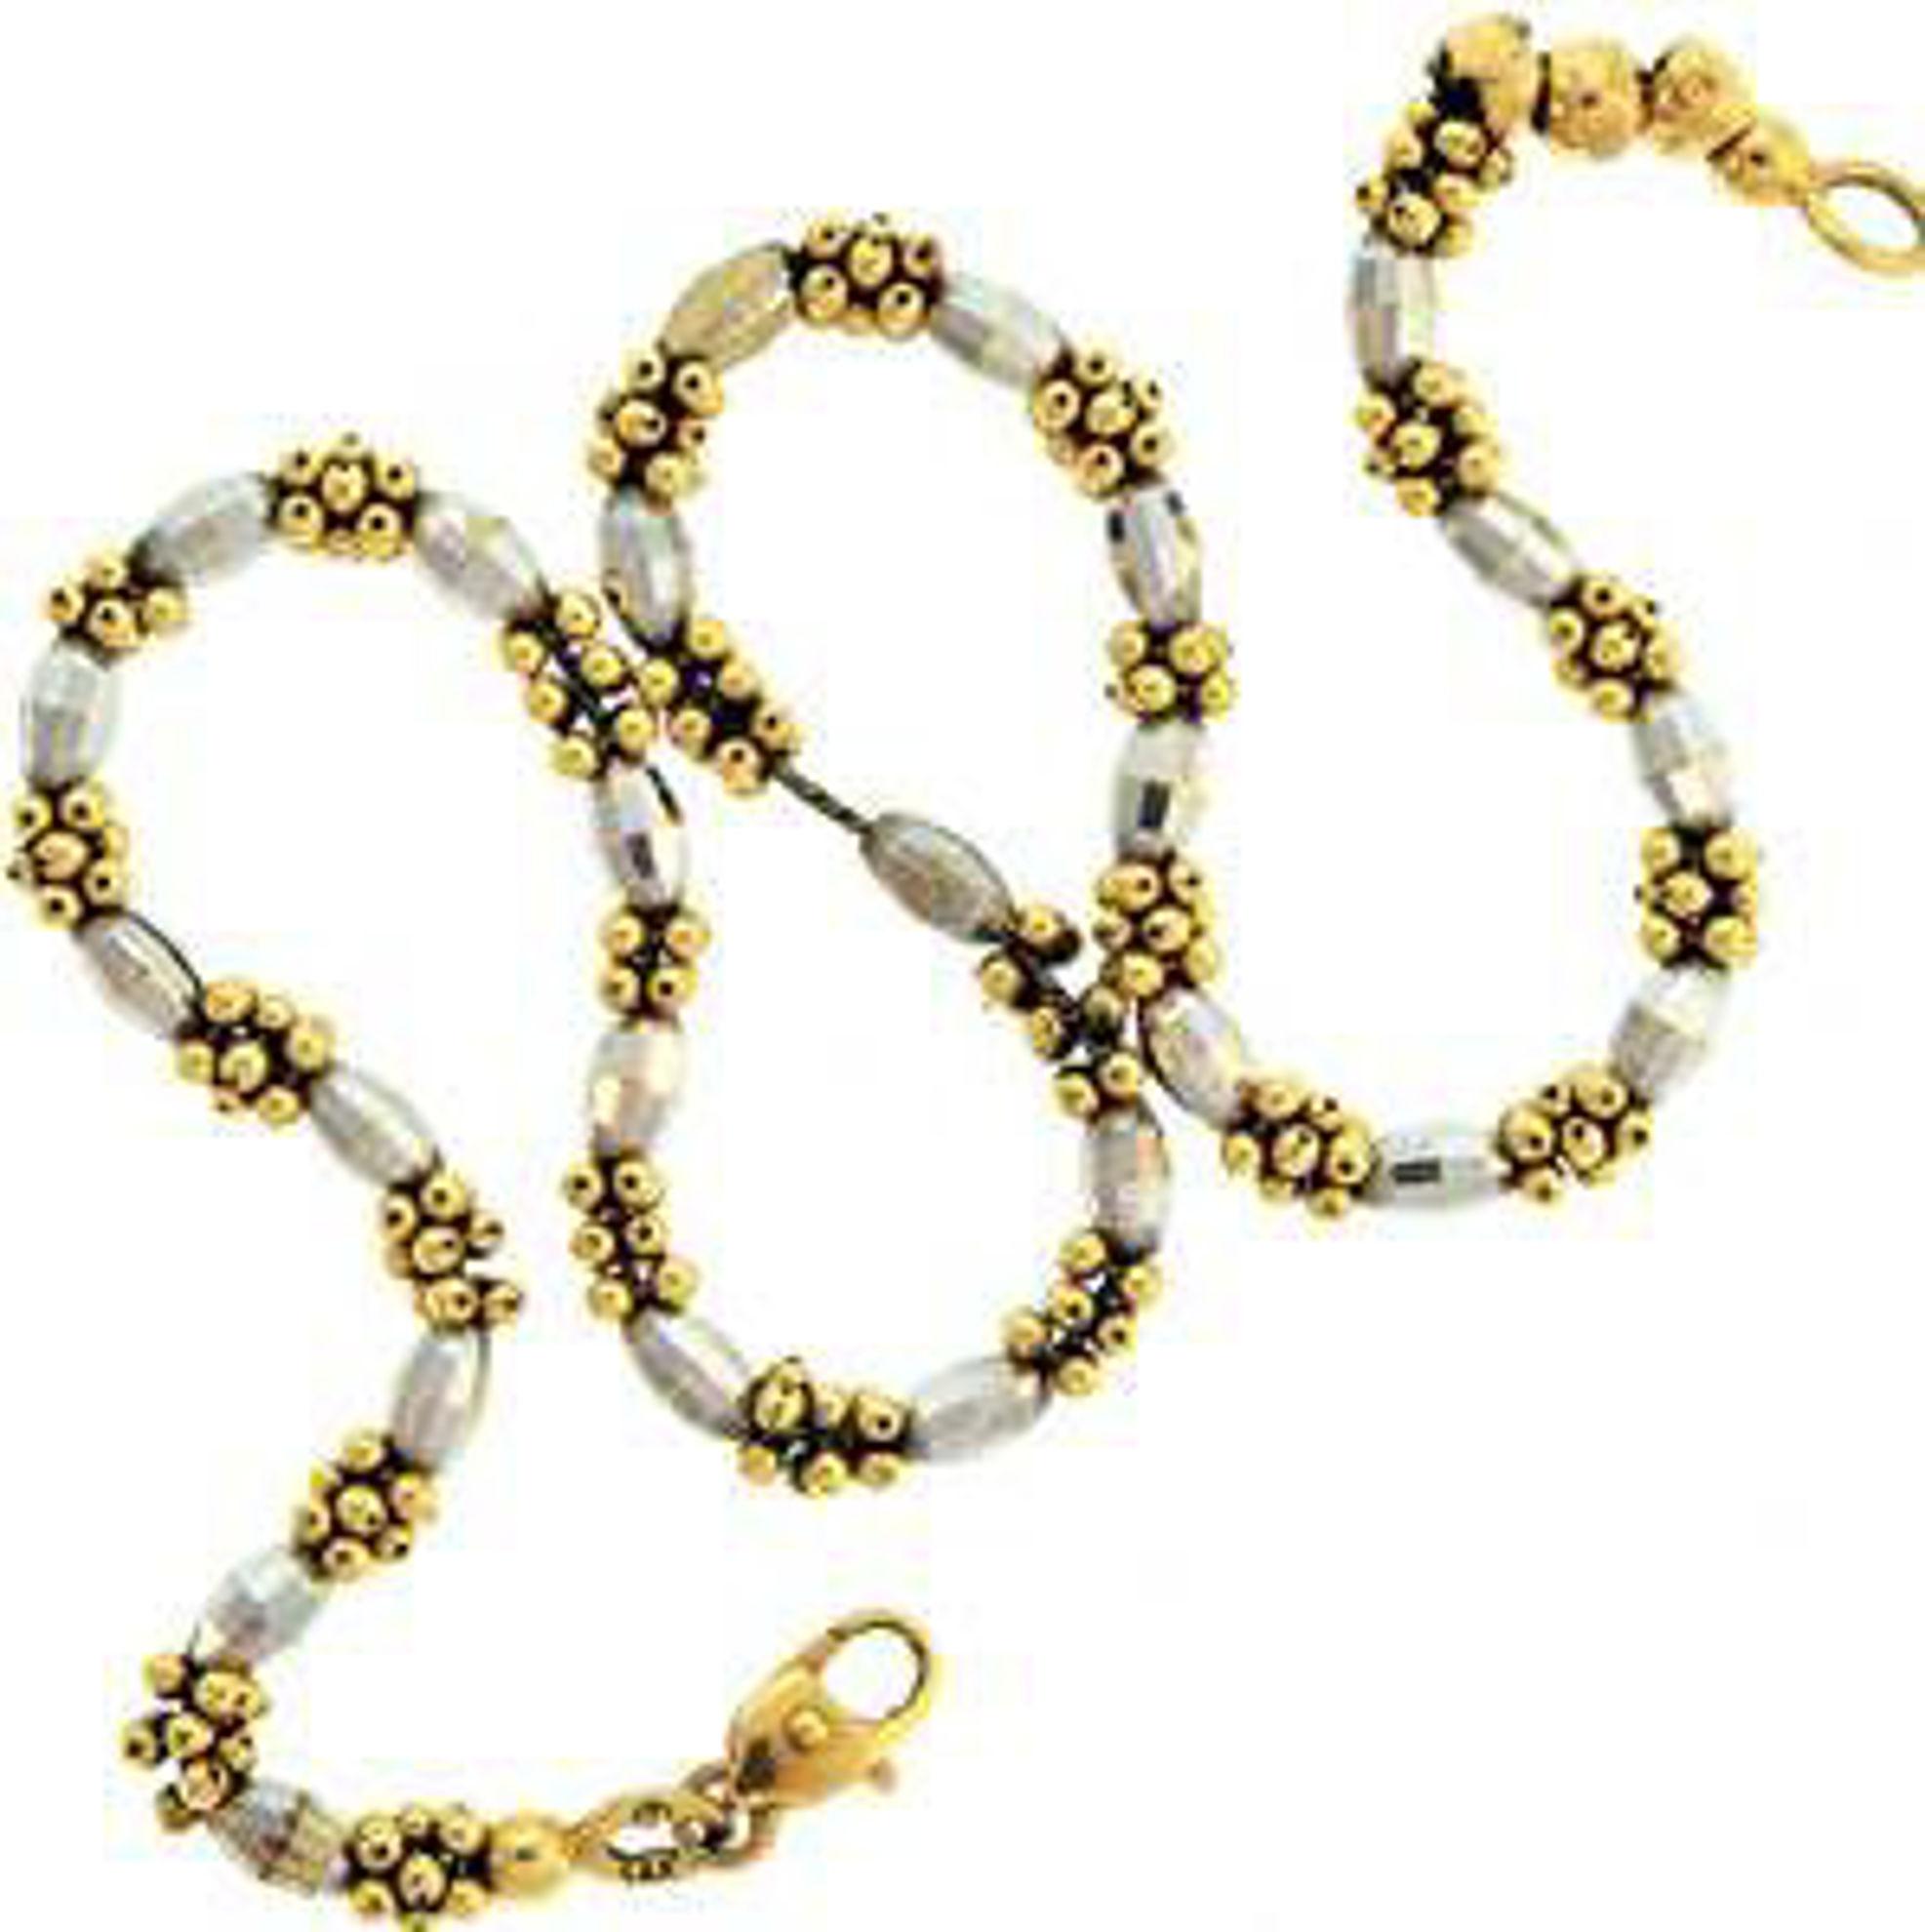 Picture of Bracelets 14kt-5.9 DWT, 9.2 Grams